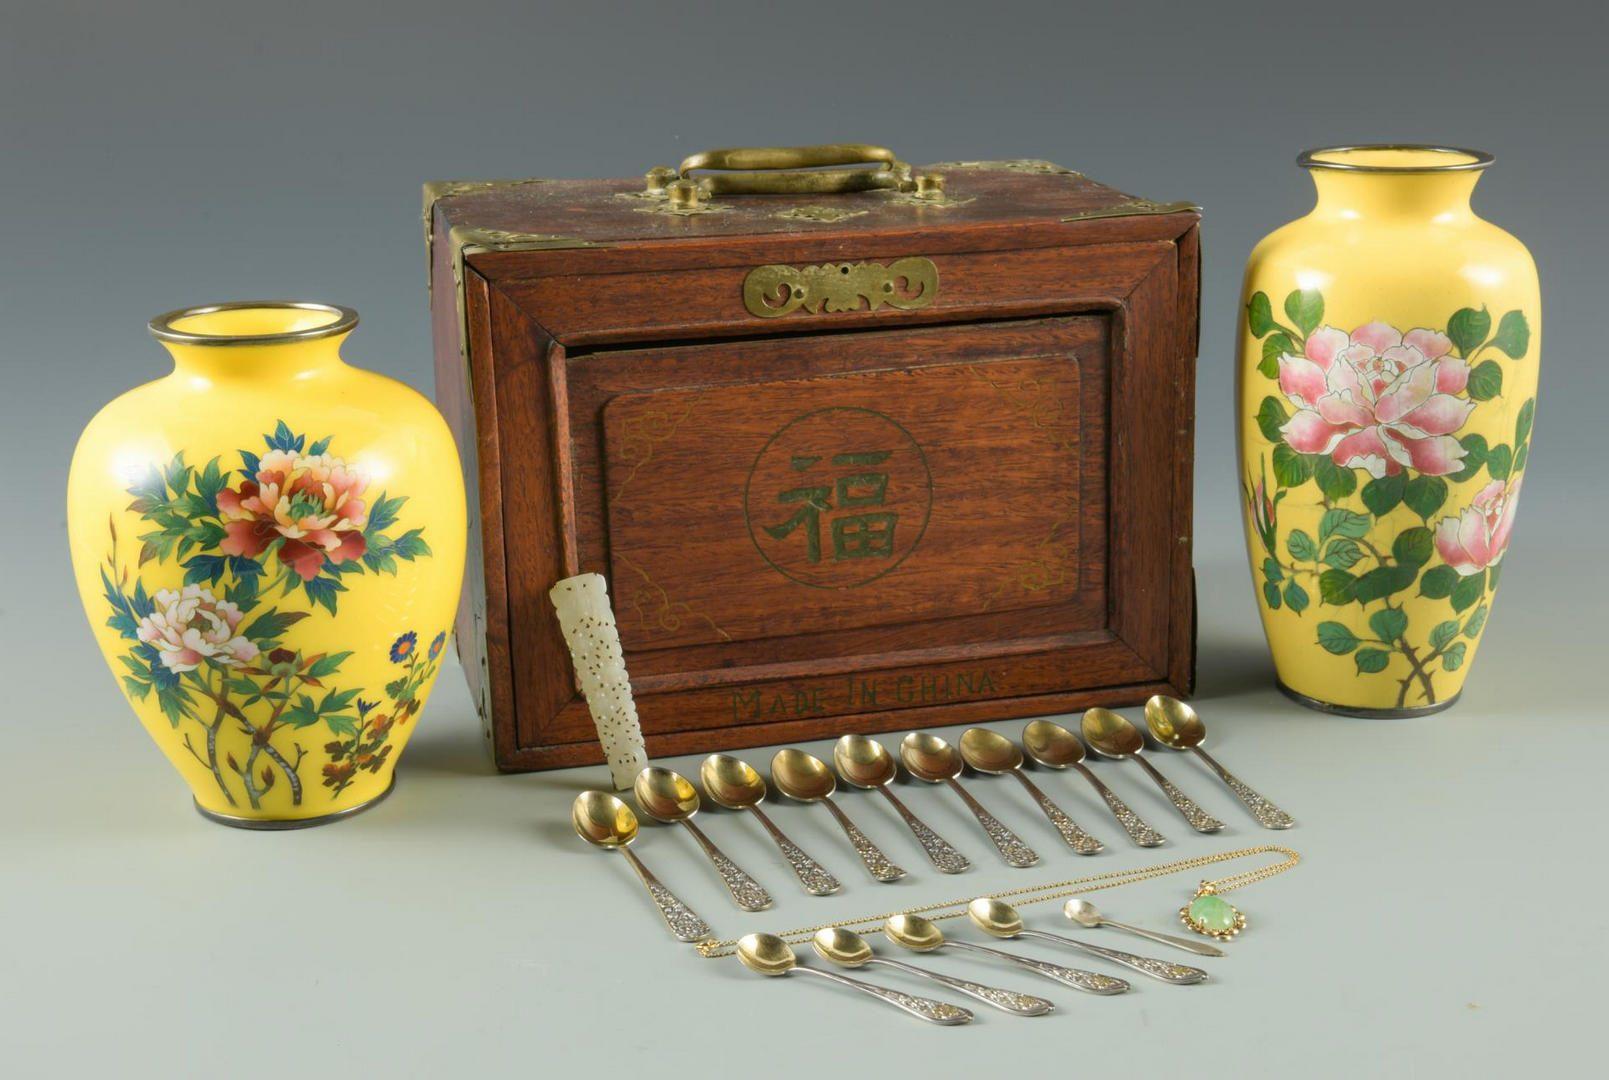 Lot 30: White Jade Brooch, Green Jade Pendant & Asian items